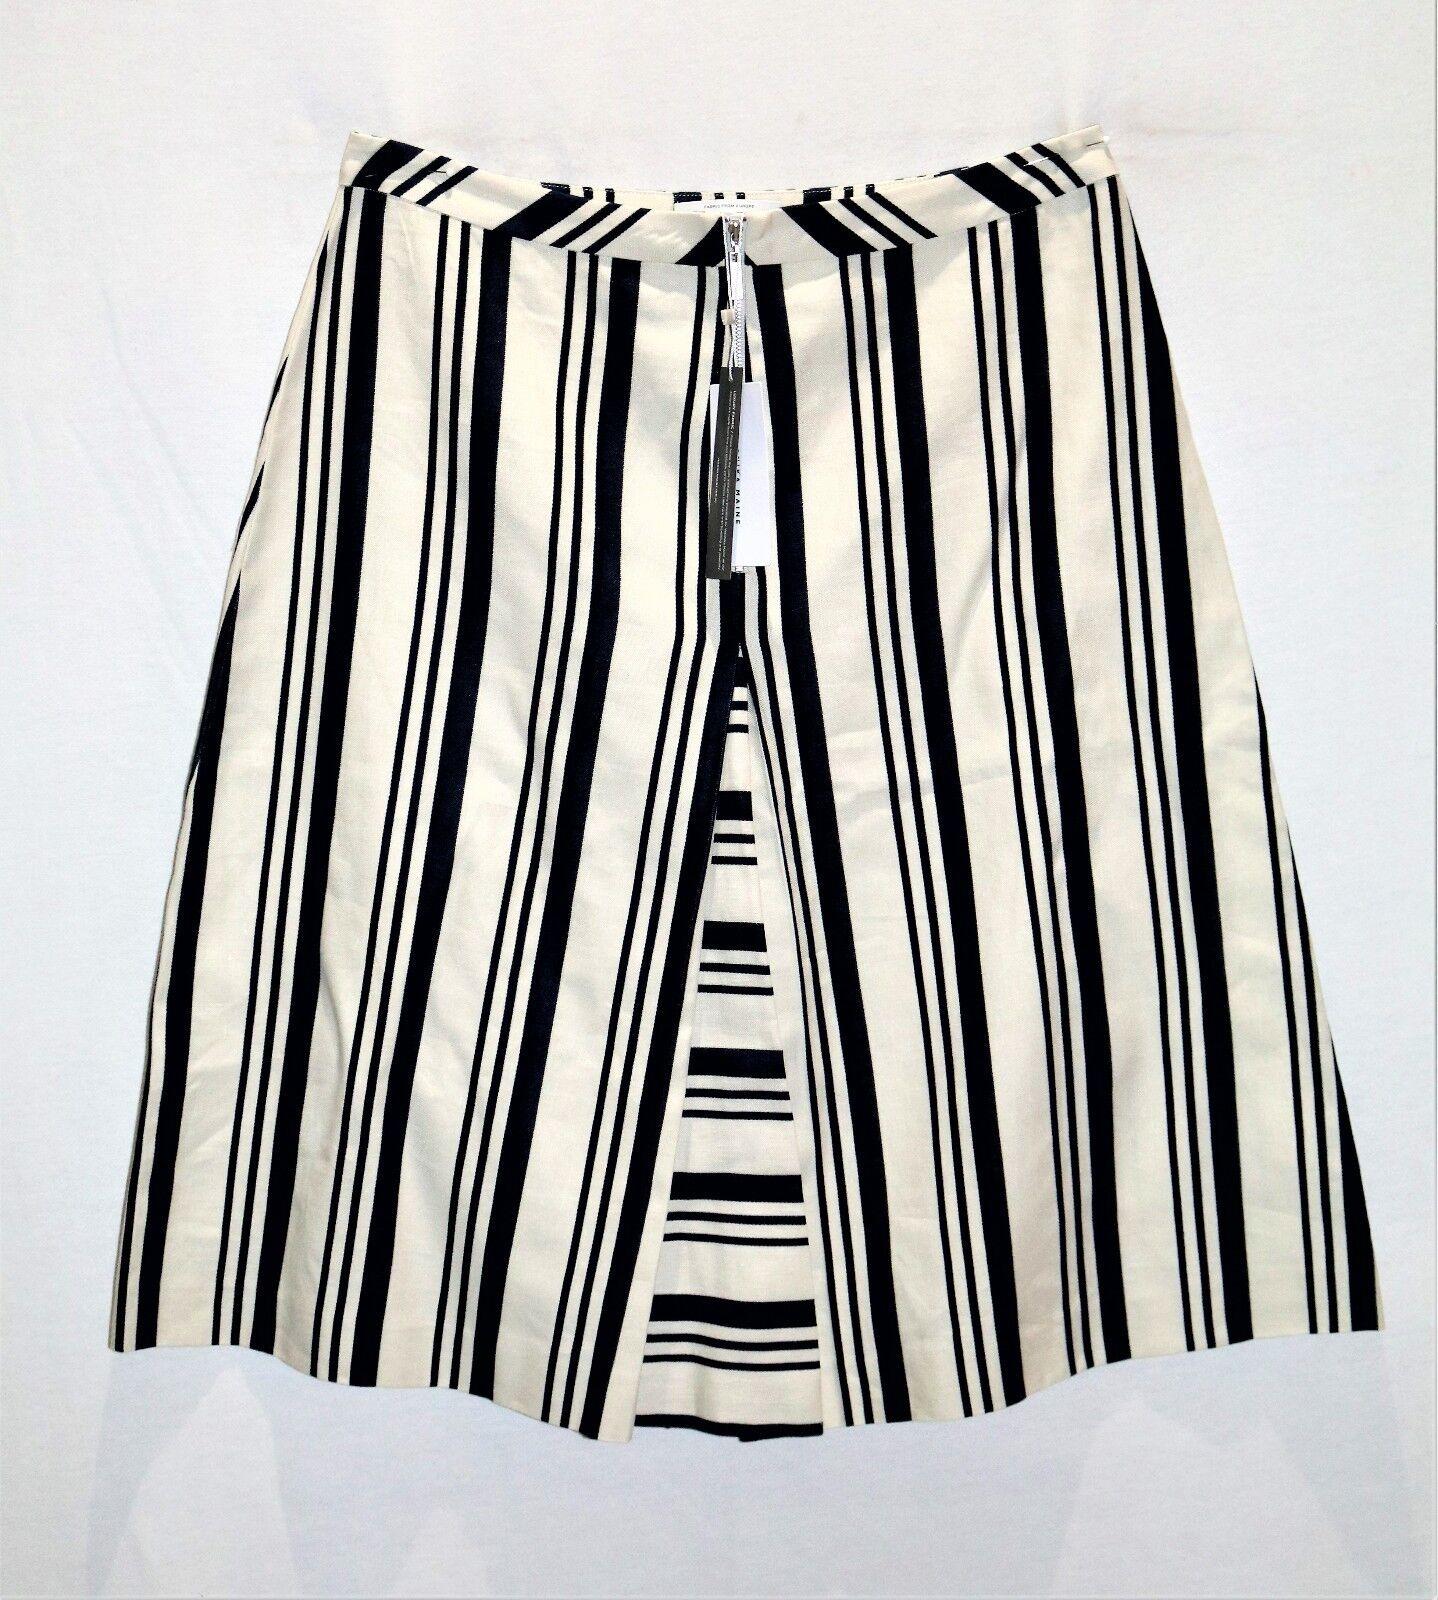 Veronika Maine Brand White bluee Stripe A Line Zip Front Skirt Size 14 BNWT  TD89